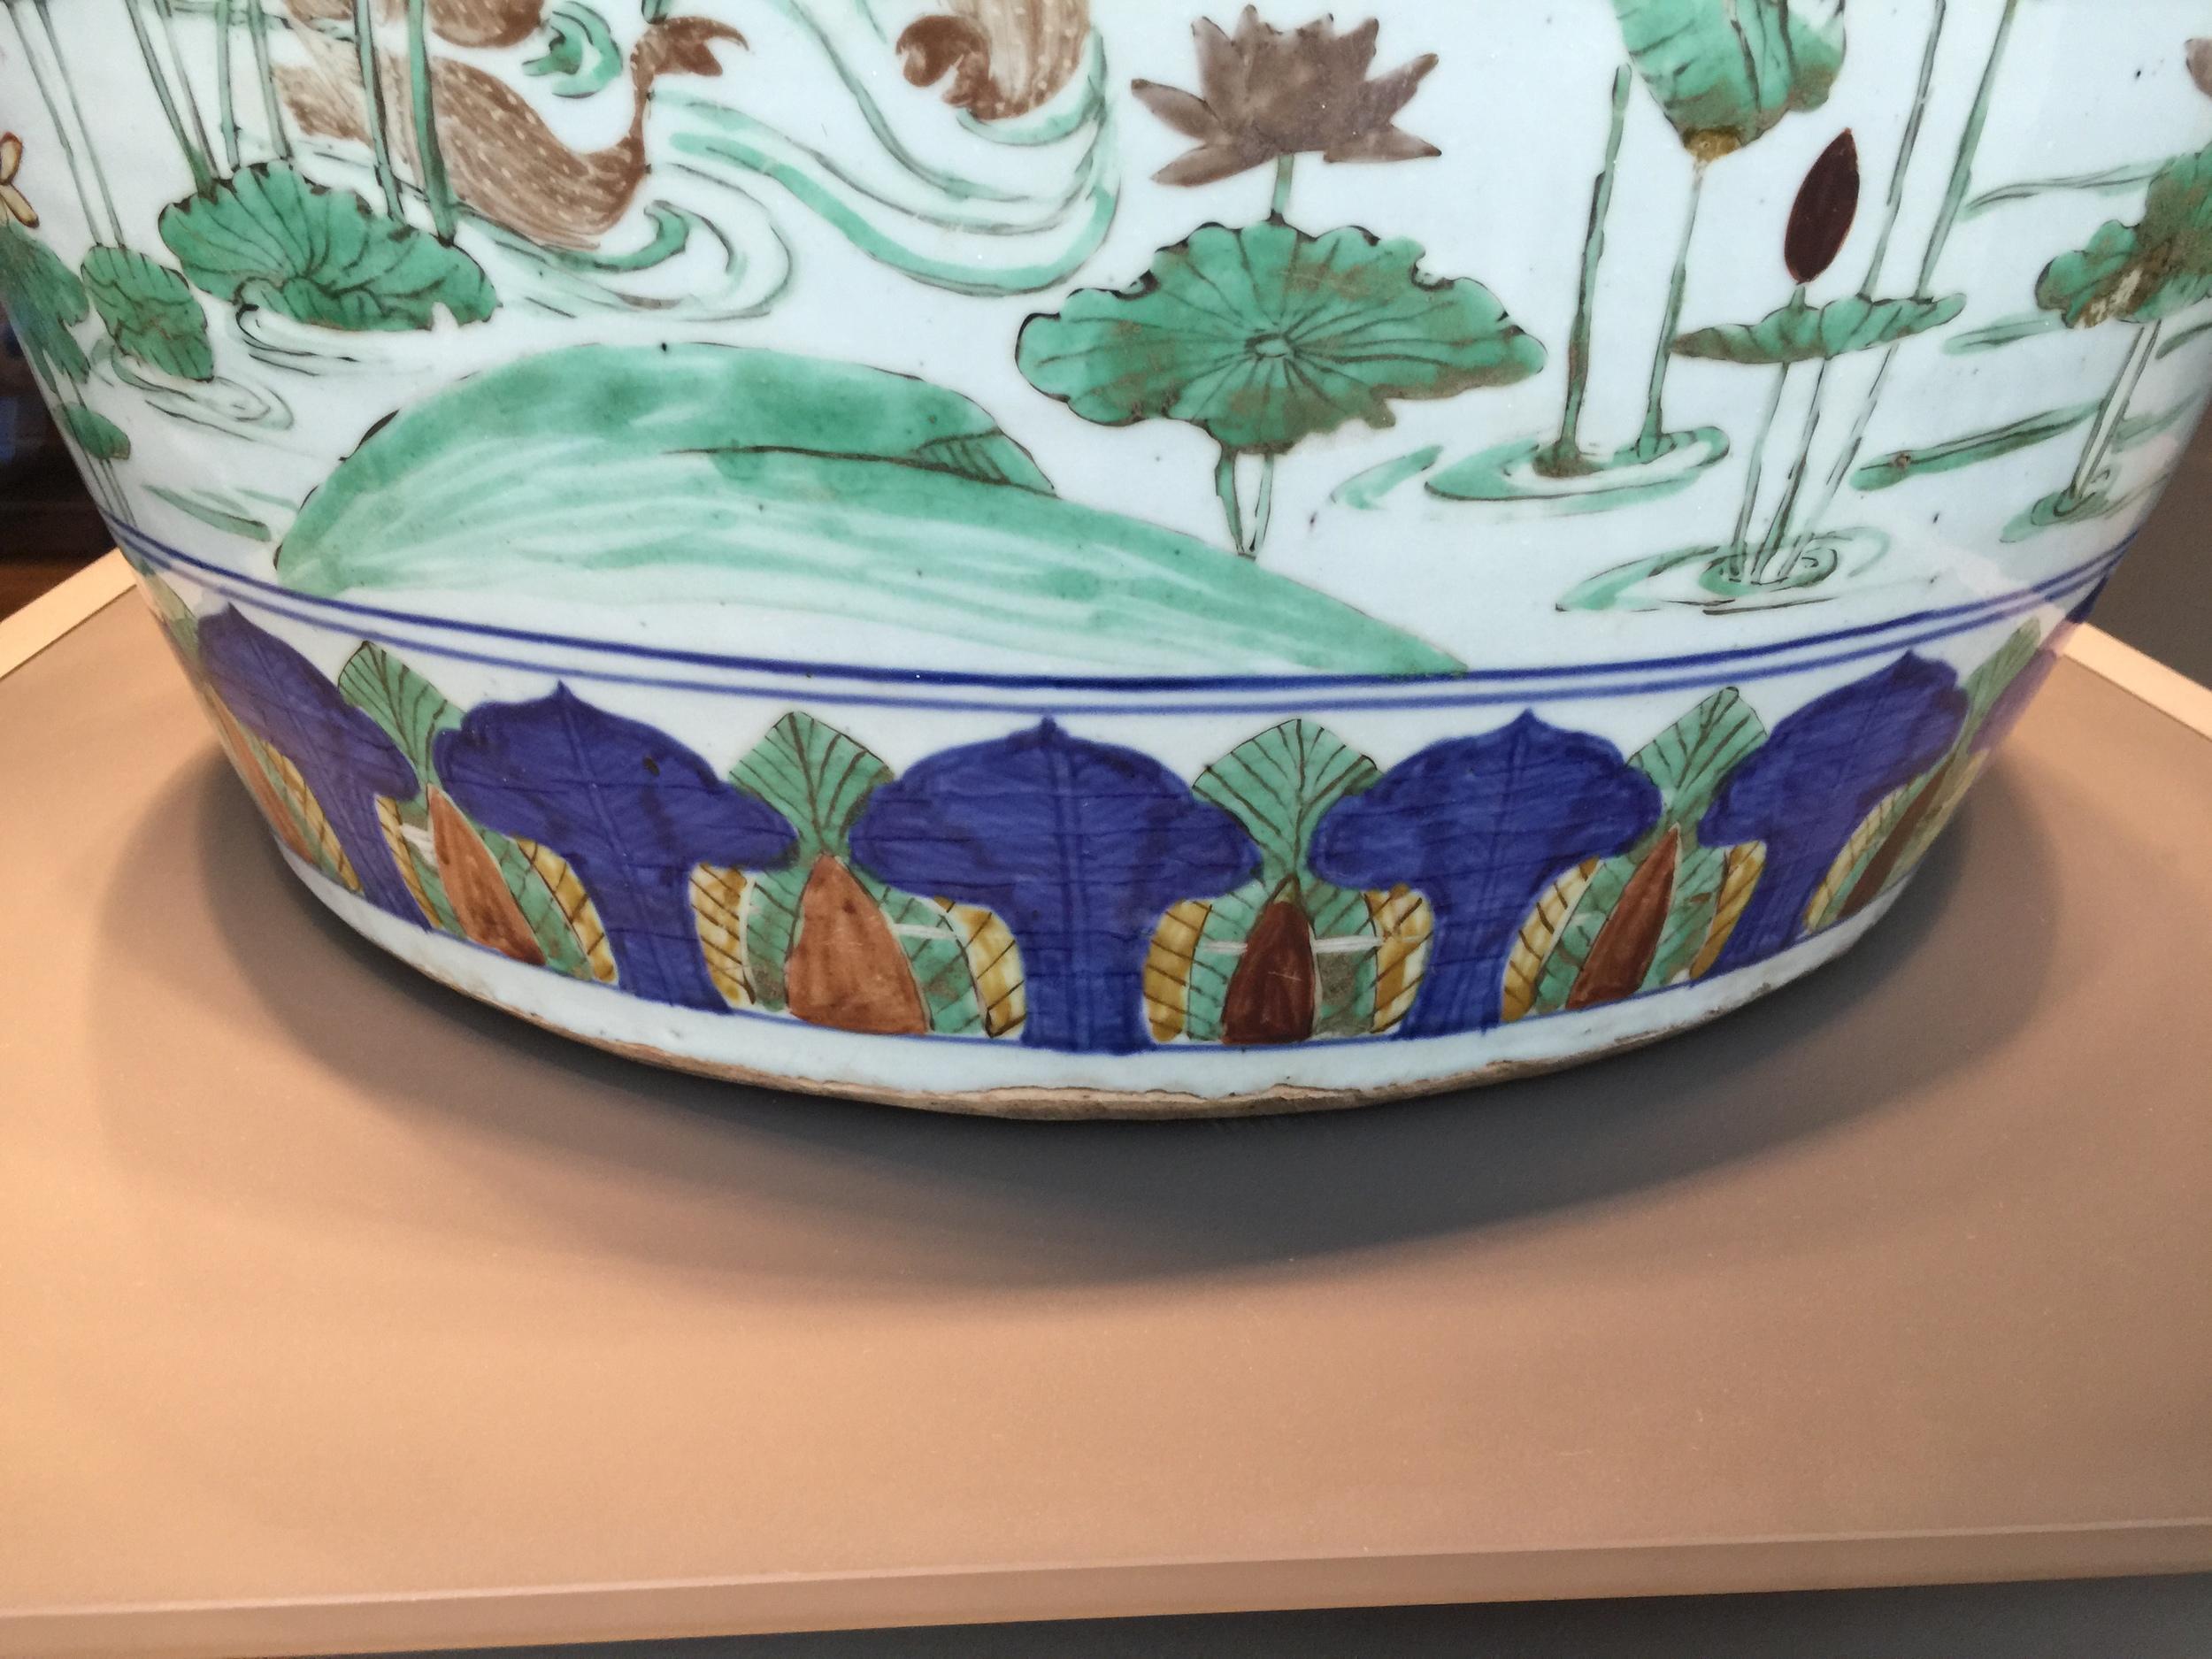 Chinese-Porcelain-British-Museum-Percival-David-jessewaugh.com-30.jpg